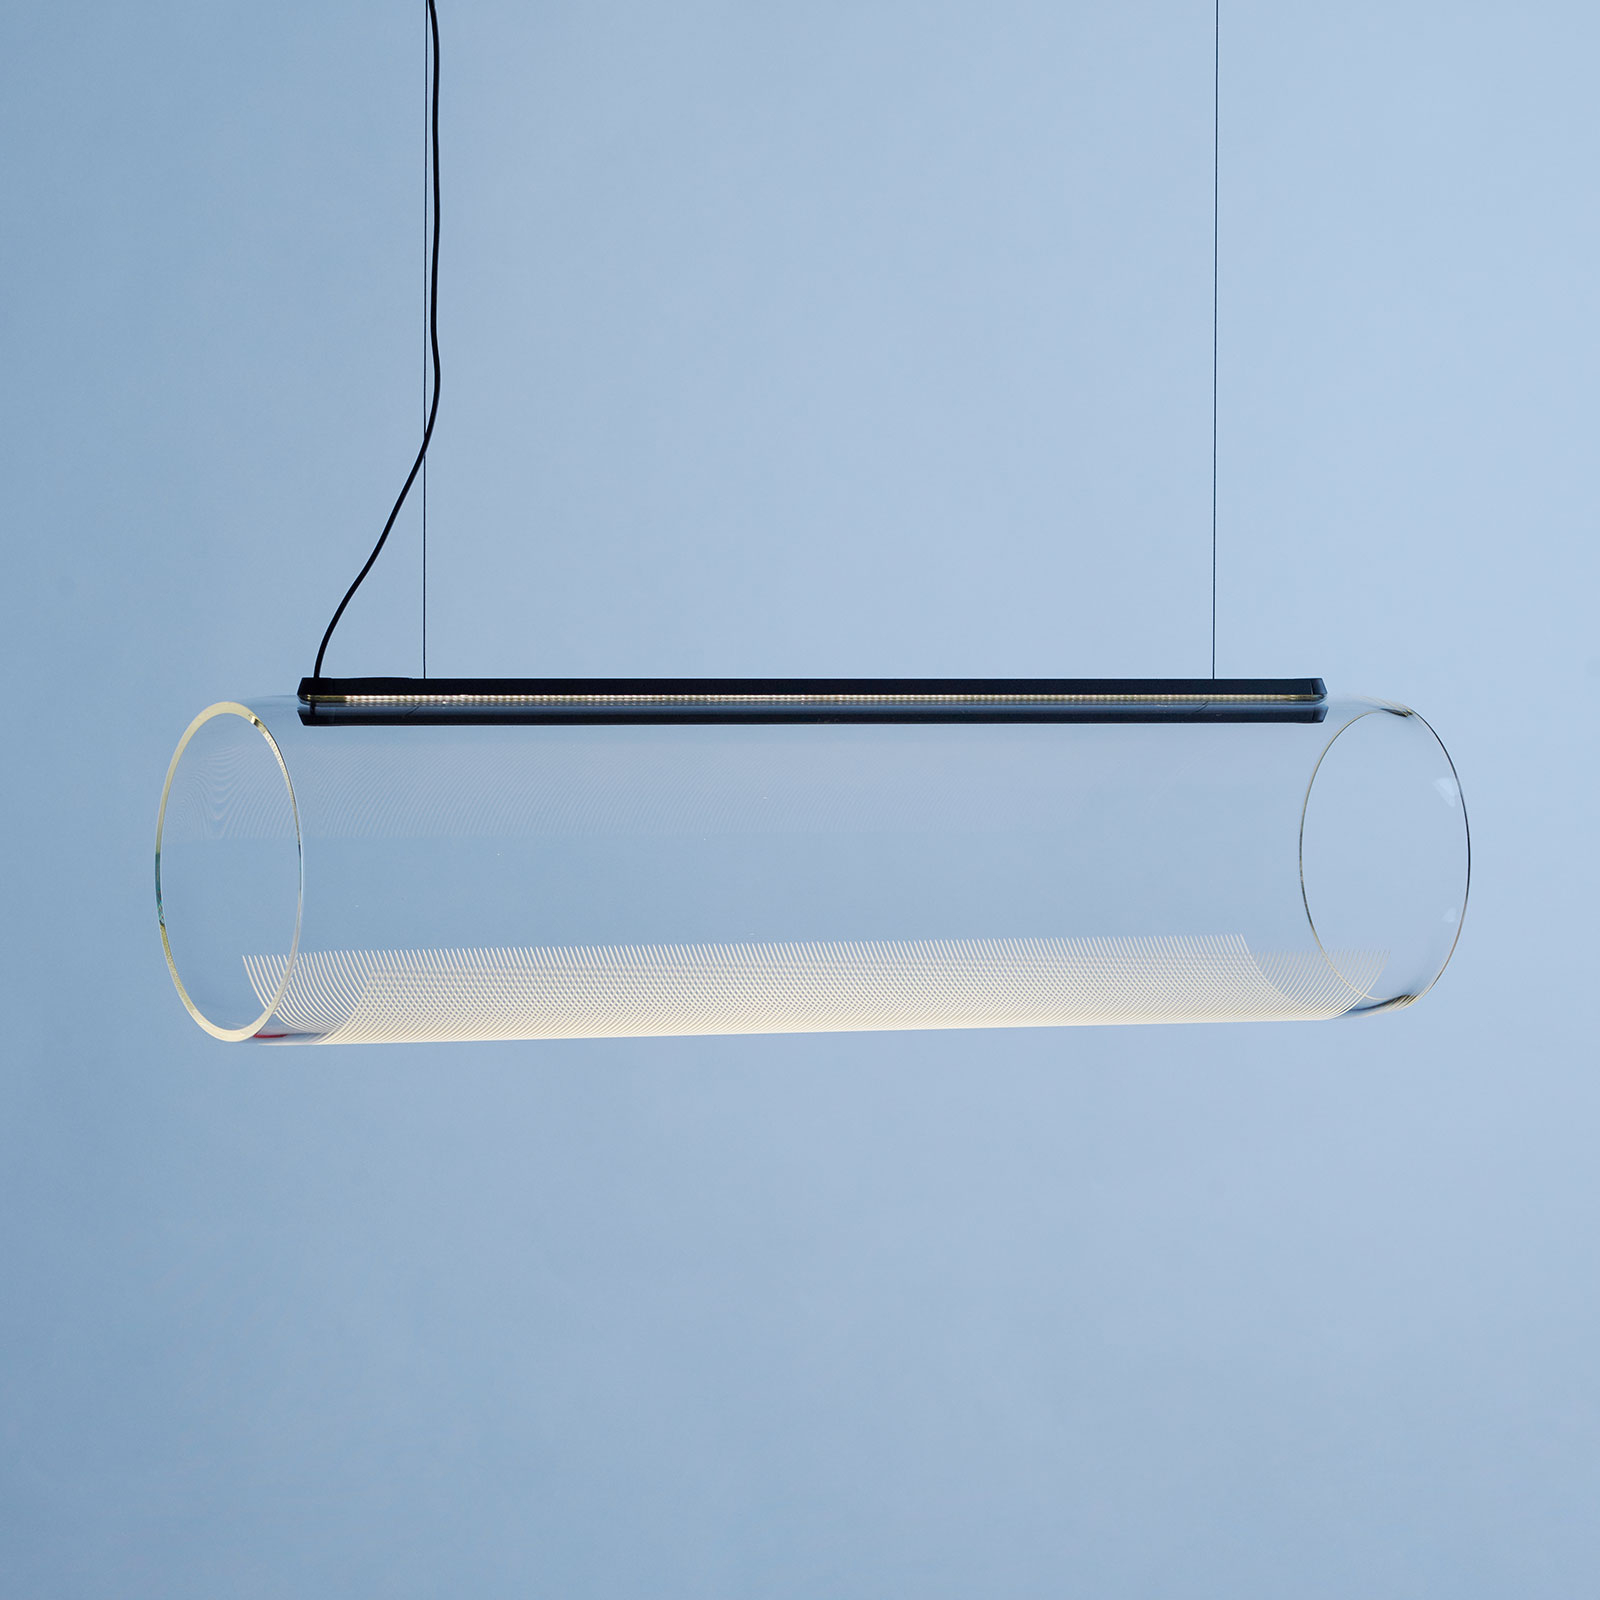 Vibia Guise 2275 Lampa wisząca LED, długość 63 cm